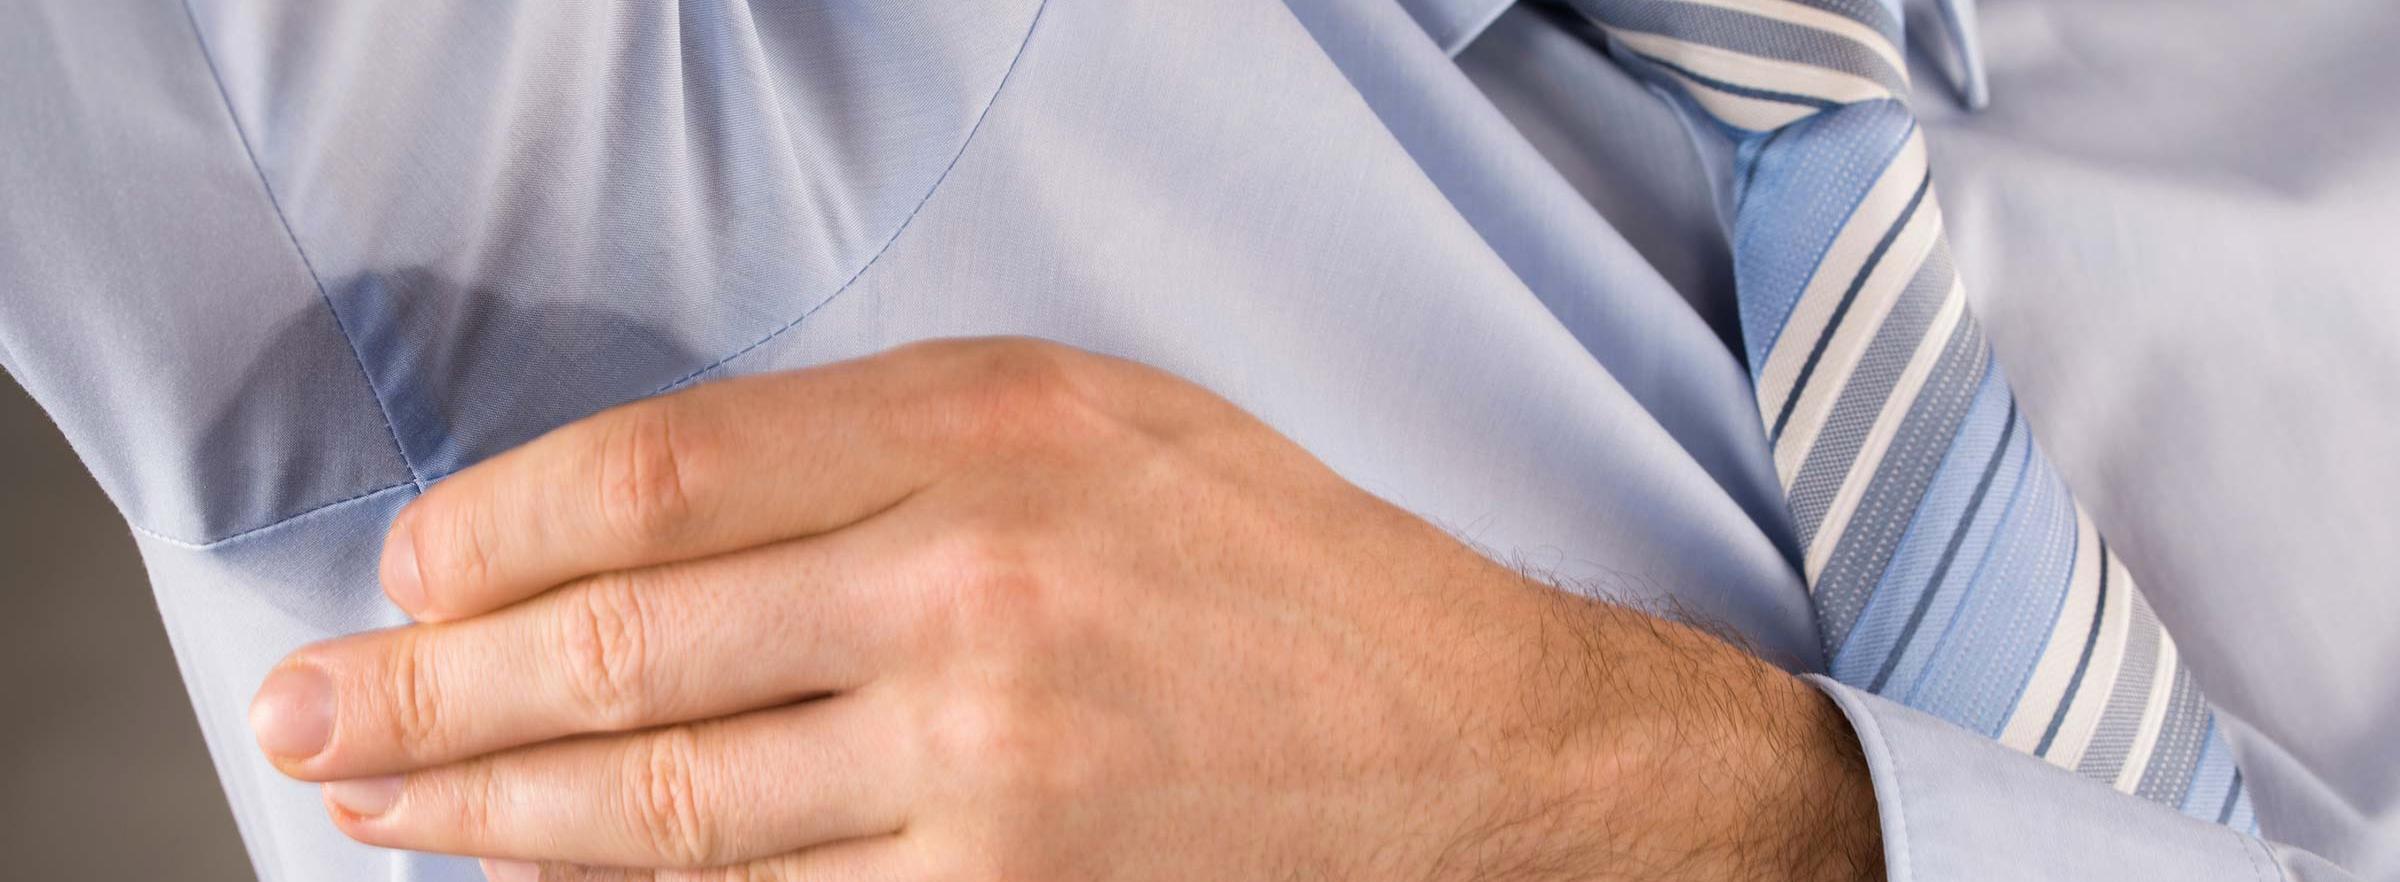 armpit stain.jpg